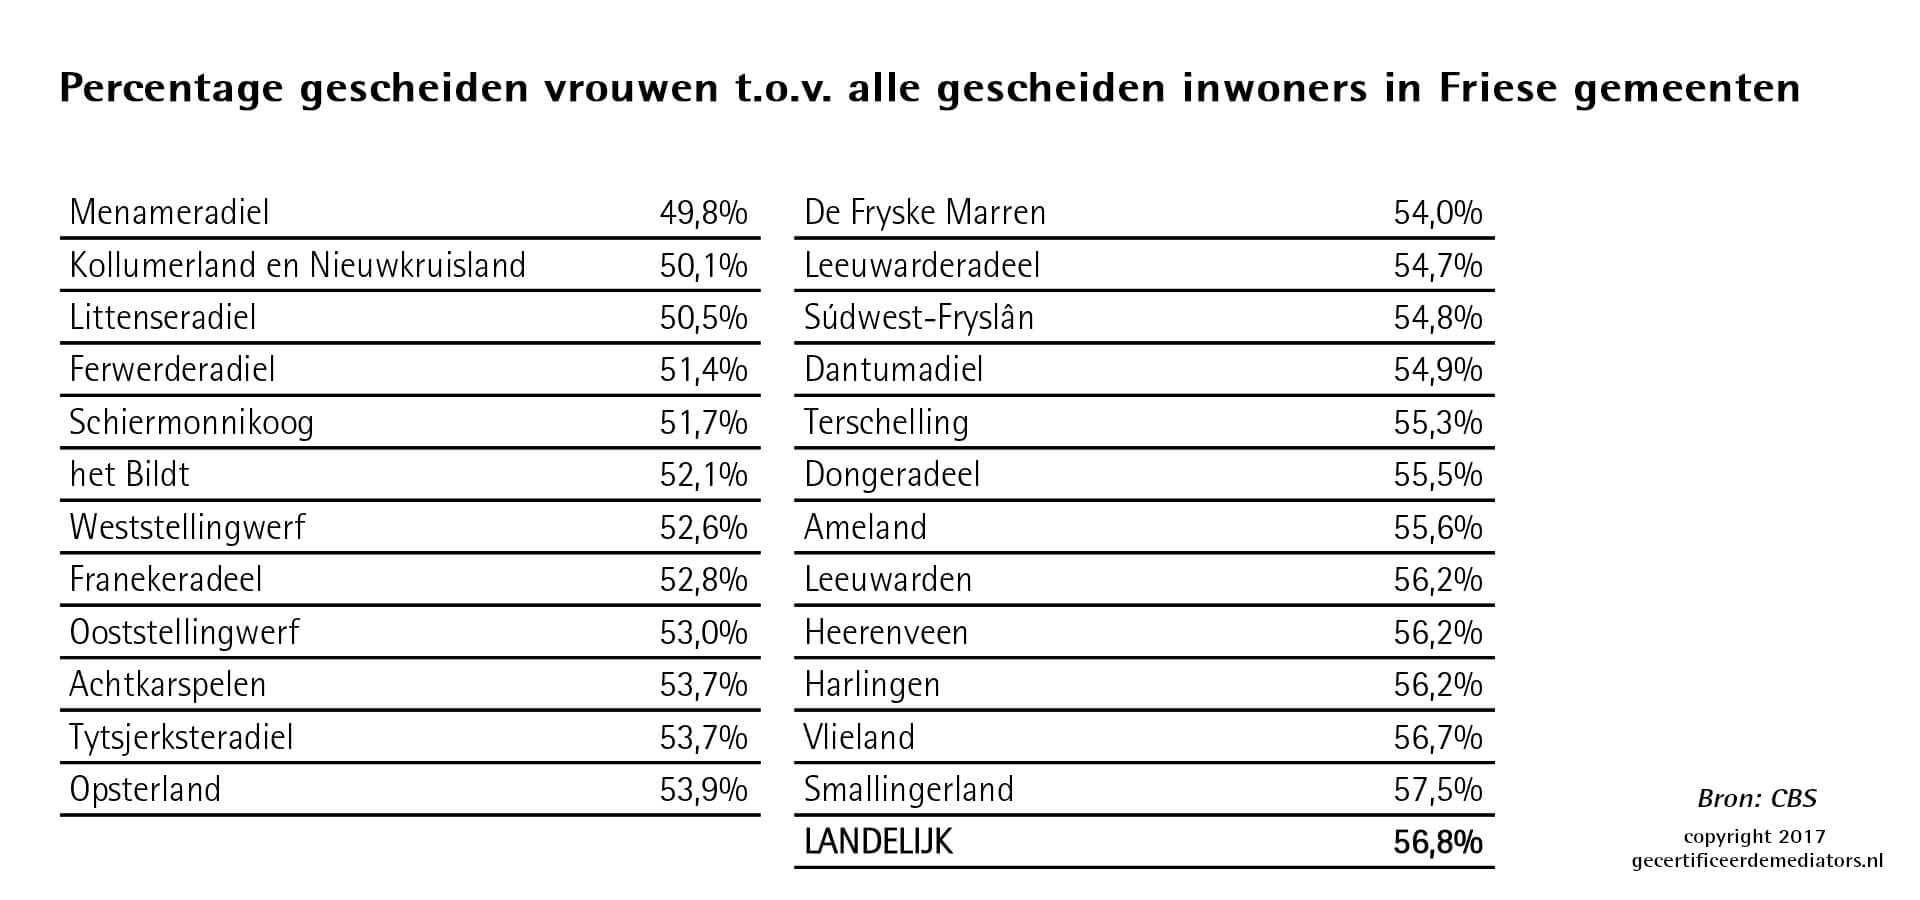 Friesland laagste percentage gescheiden vrouwen